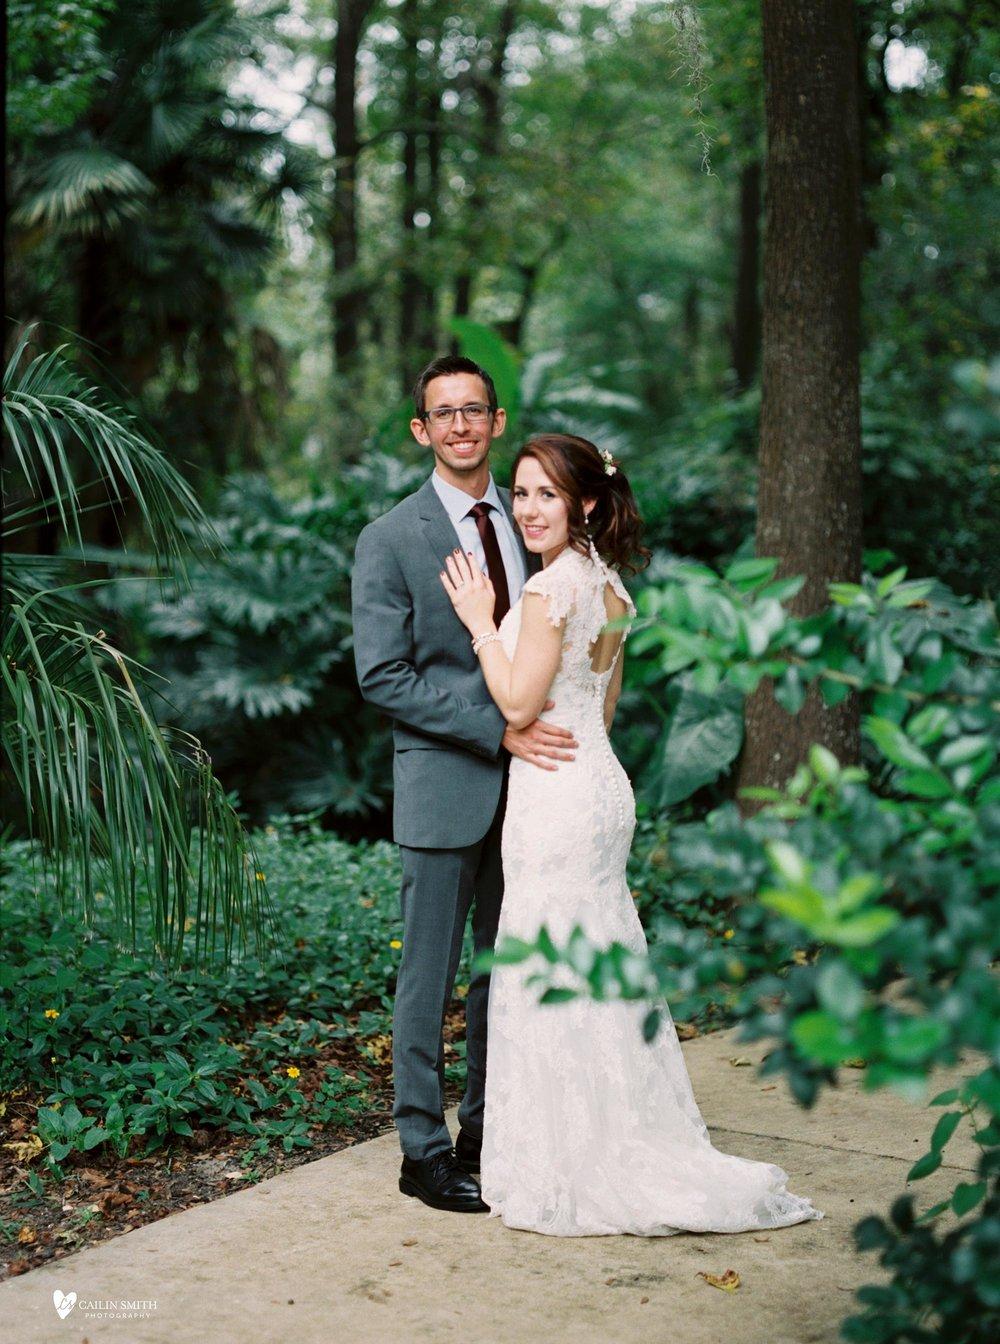 Shelby_Jeff_Ponte_Vedra_Hilltop_Club_Wedding_Photography_044.jpg